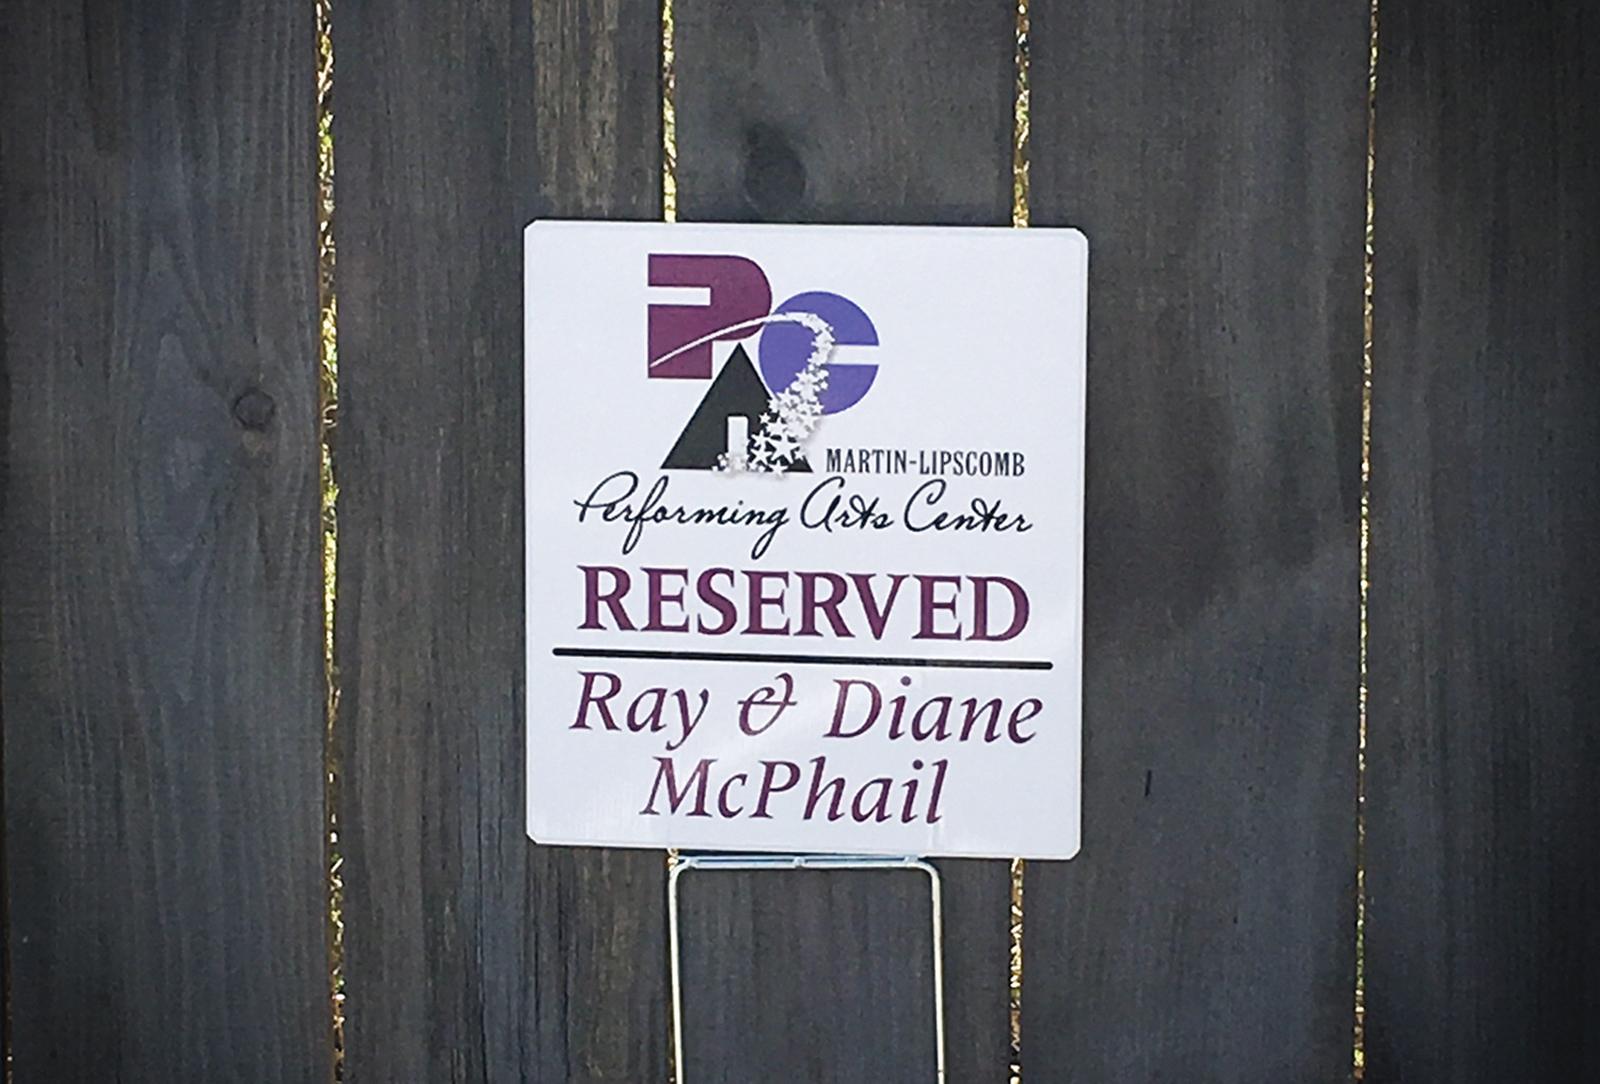 Highlands_Pac_Reserved_Parking